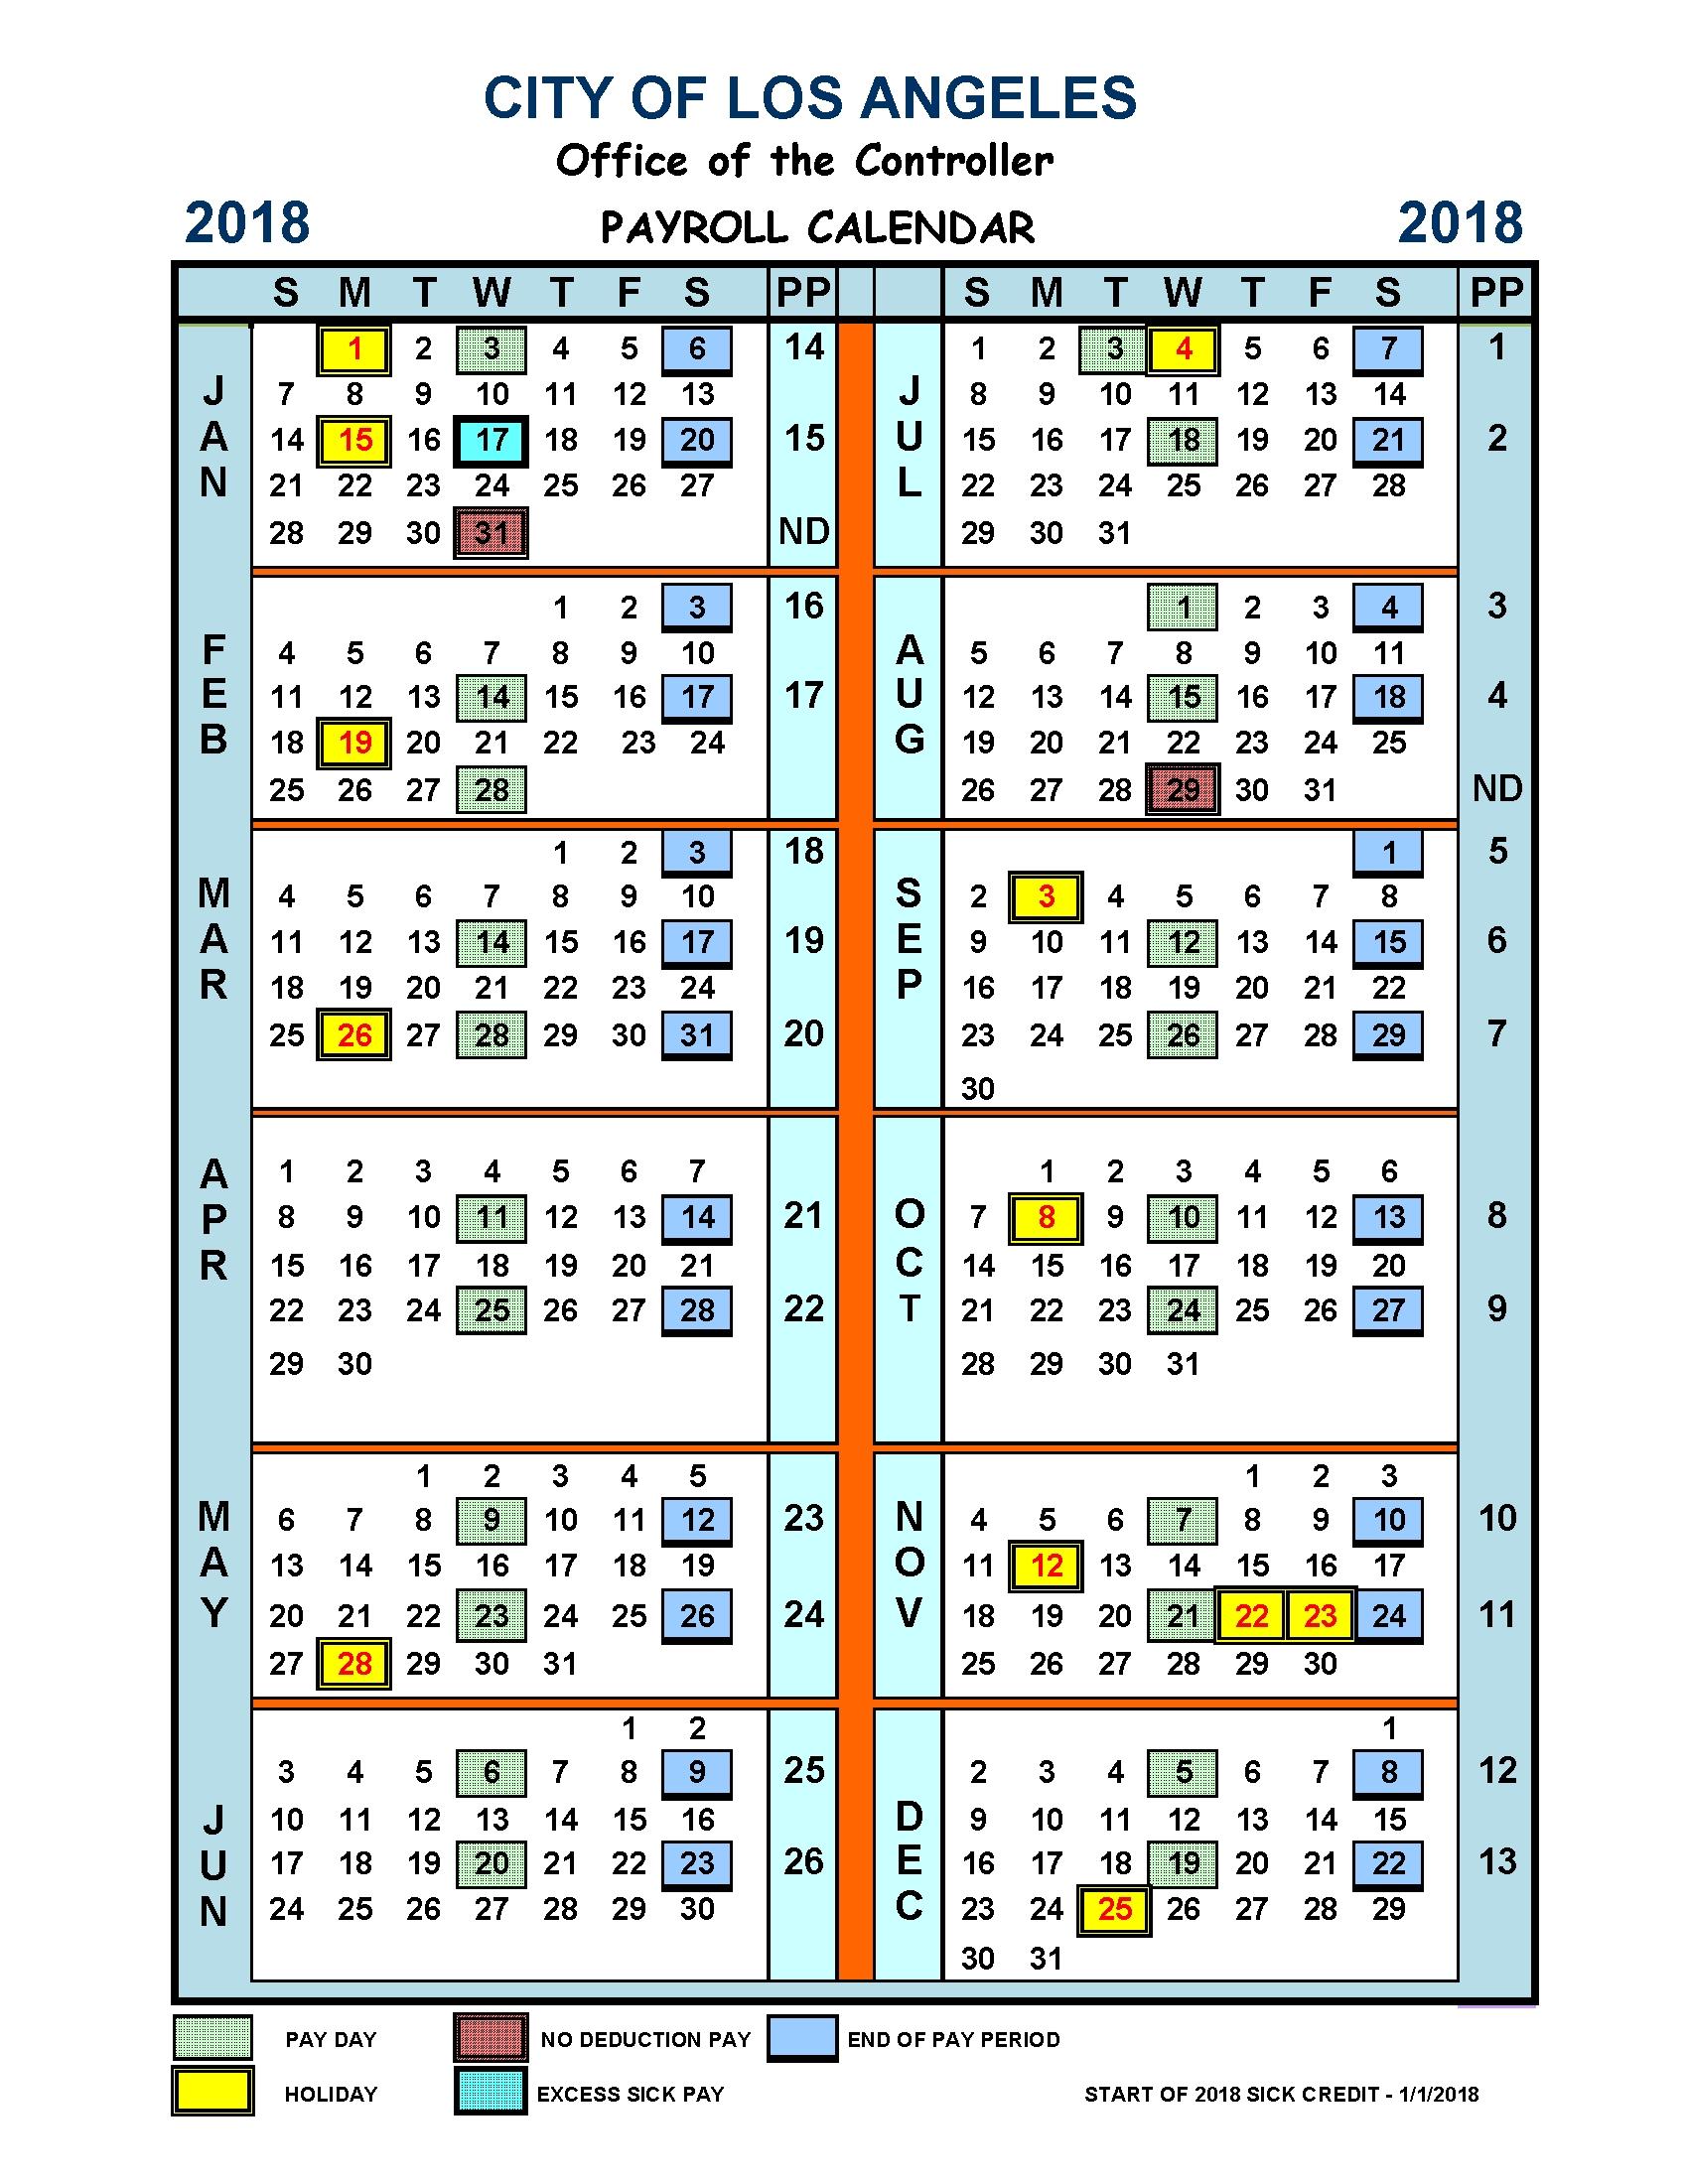 Biweekly Payroll Calendar Excel | Payroll Calendars-Biweekly Payroll Calendar 2020 Template